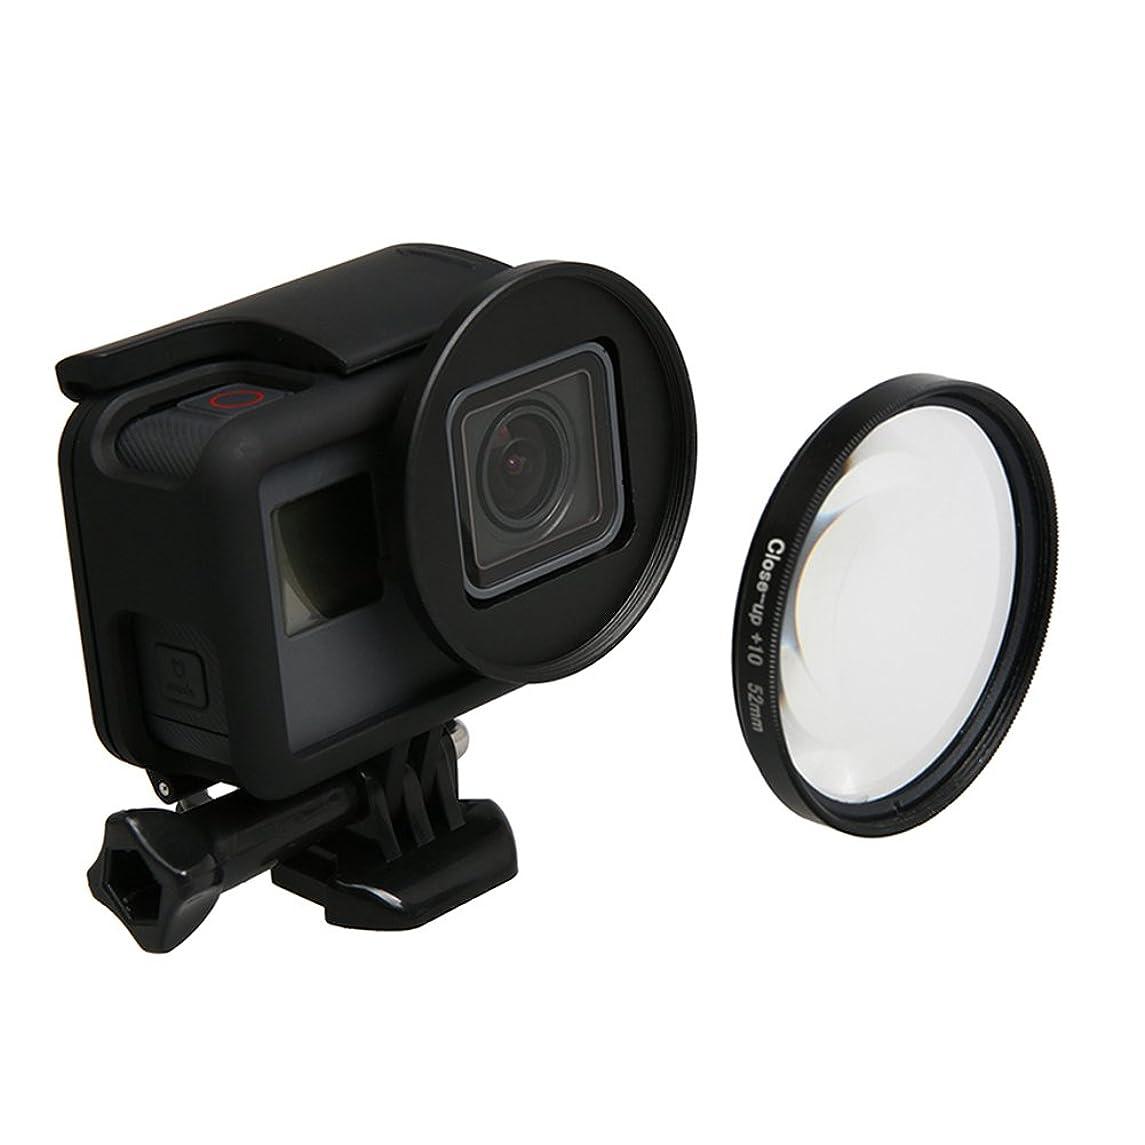 Meijunter 52mm Macro Lens 10X Magnification for GoPro Hero 6/Hero 5 Black Camera, HD Macro Filter Lens 10X Magnification + Adapter Ring Accessories